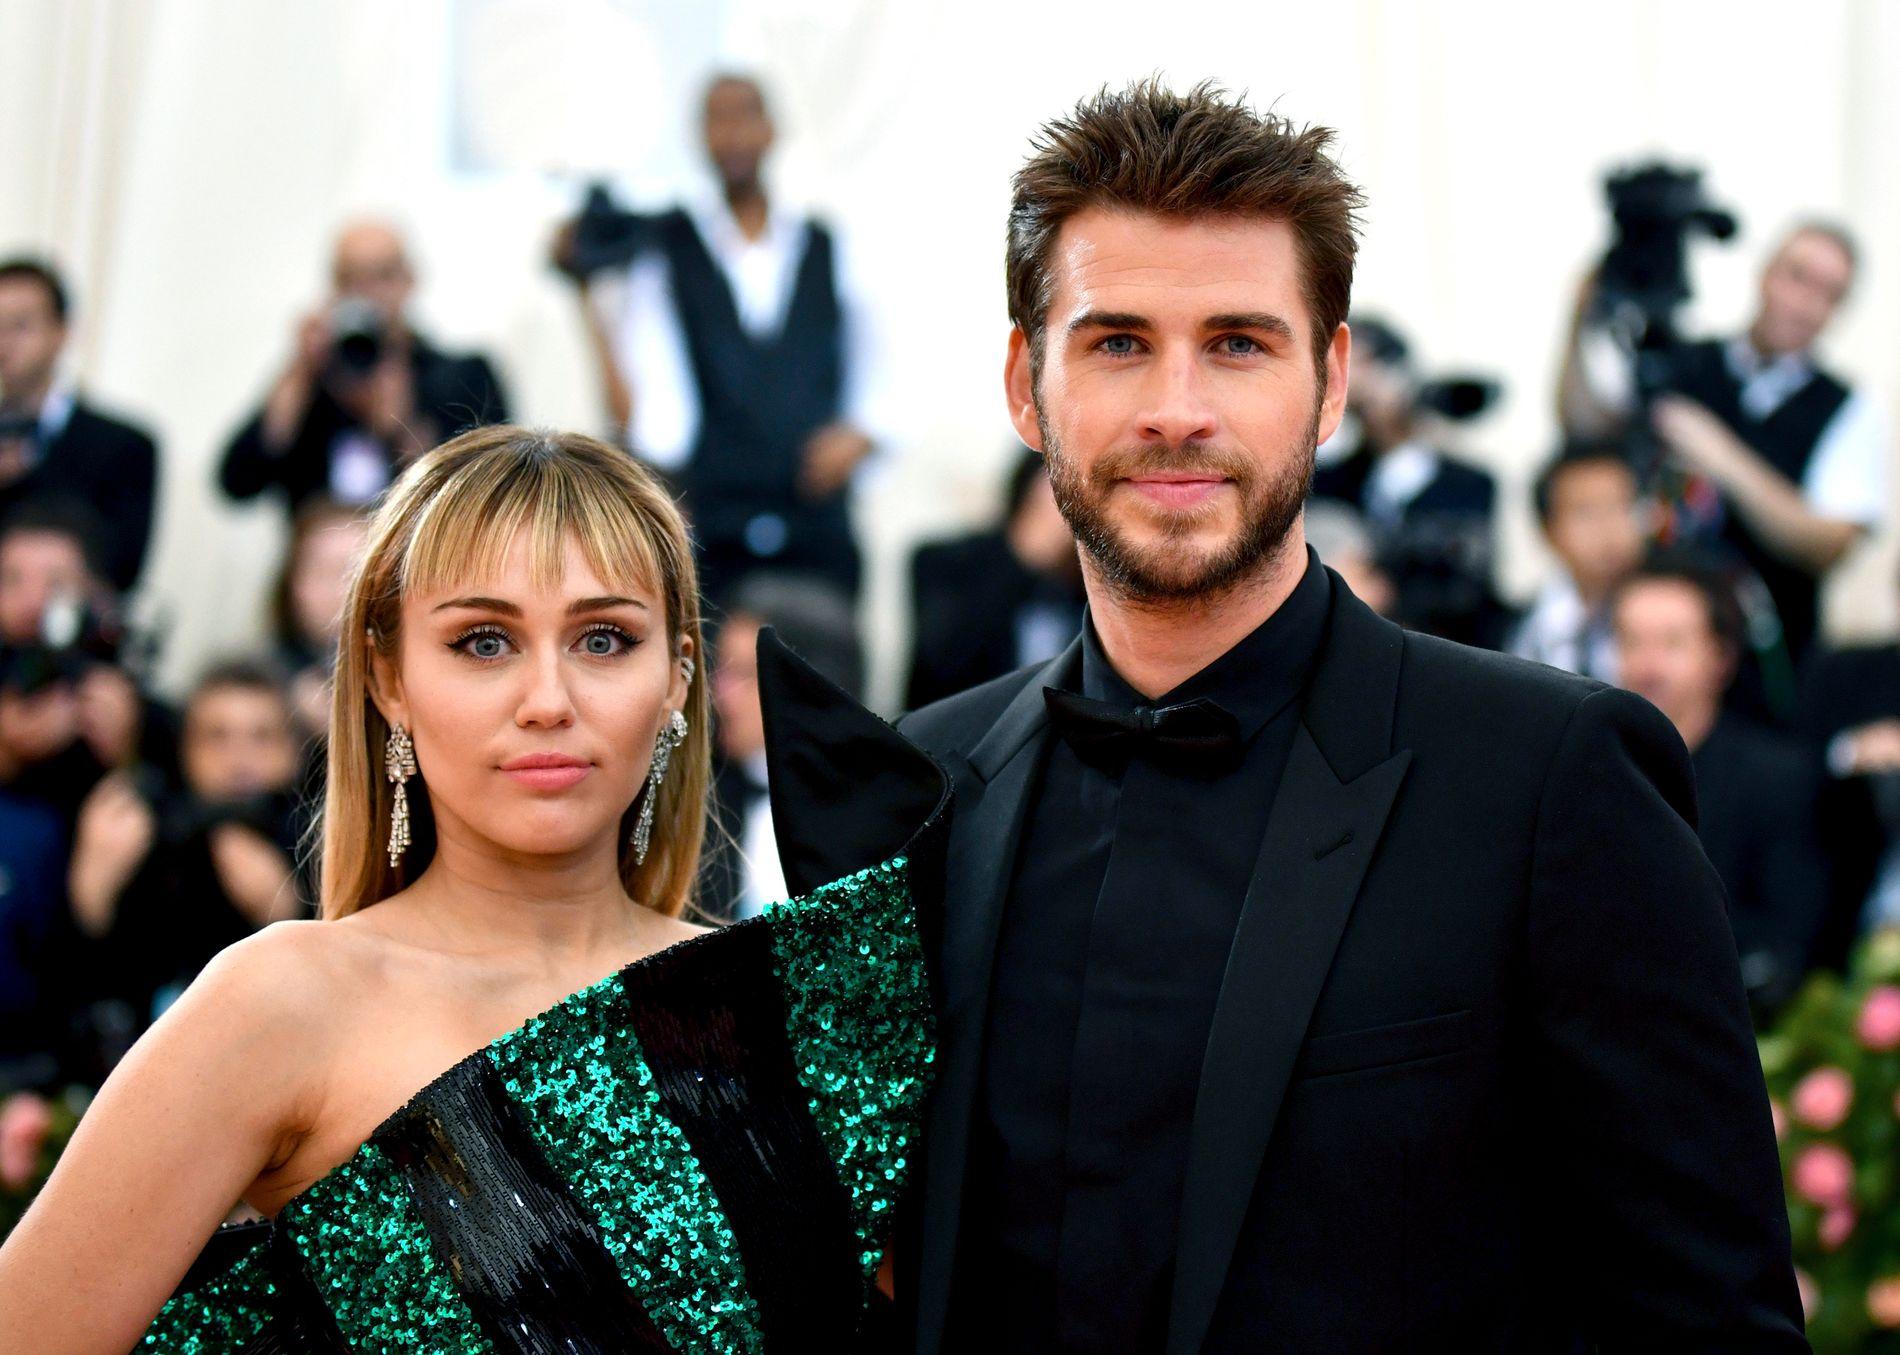 Miley Cyrus og Liam Hemsworth på gallaen The Metropolitan Museum of Art's Costume Institute benefit gala i New York. Nå er det offisielt over mellom de to. Foto: Charles Sykes / Invision / AP / NTB scanpix